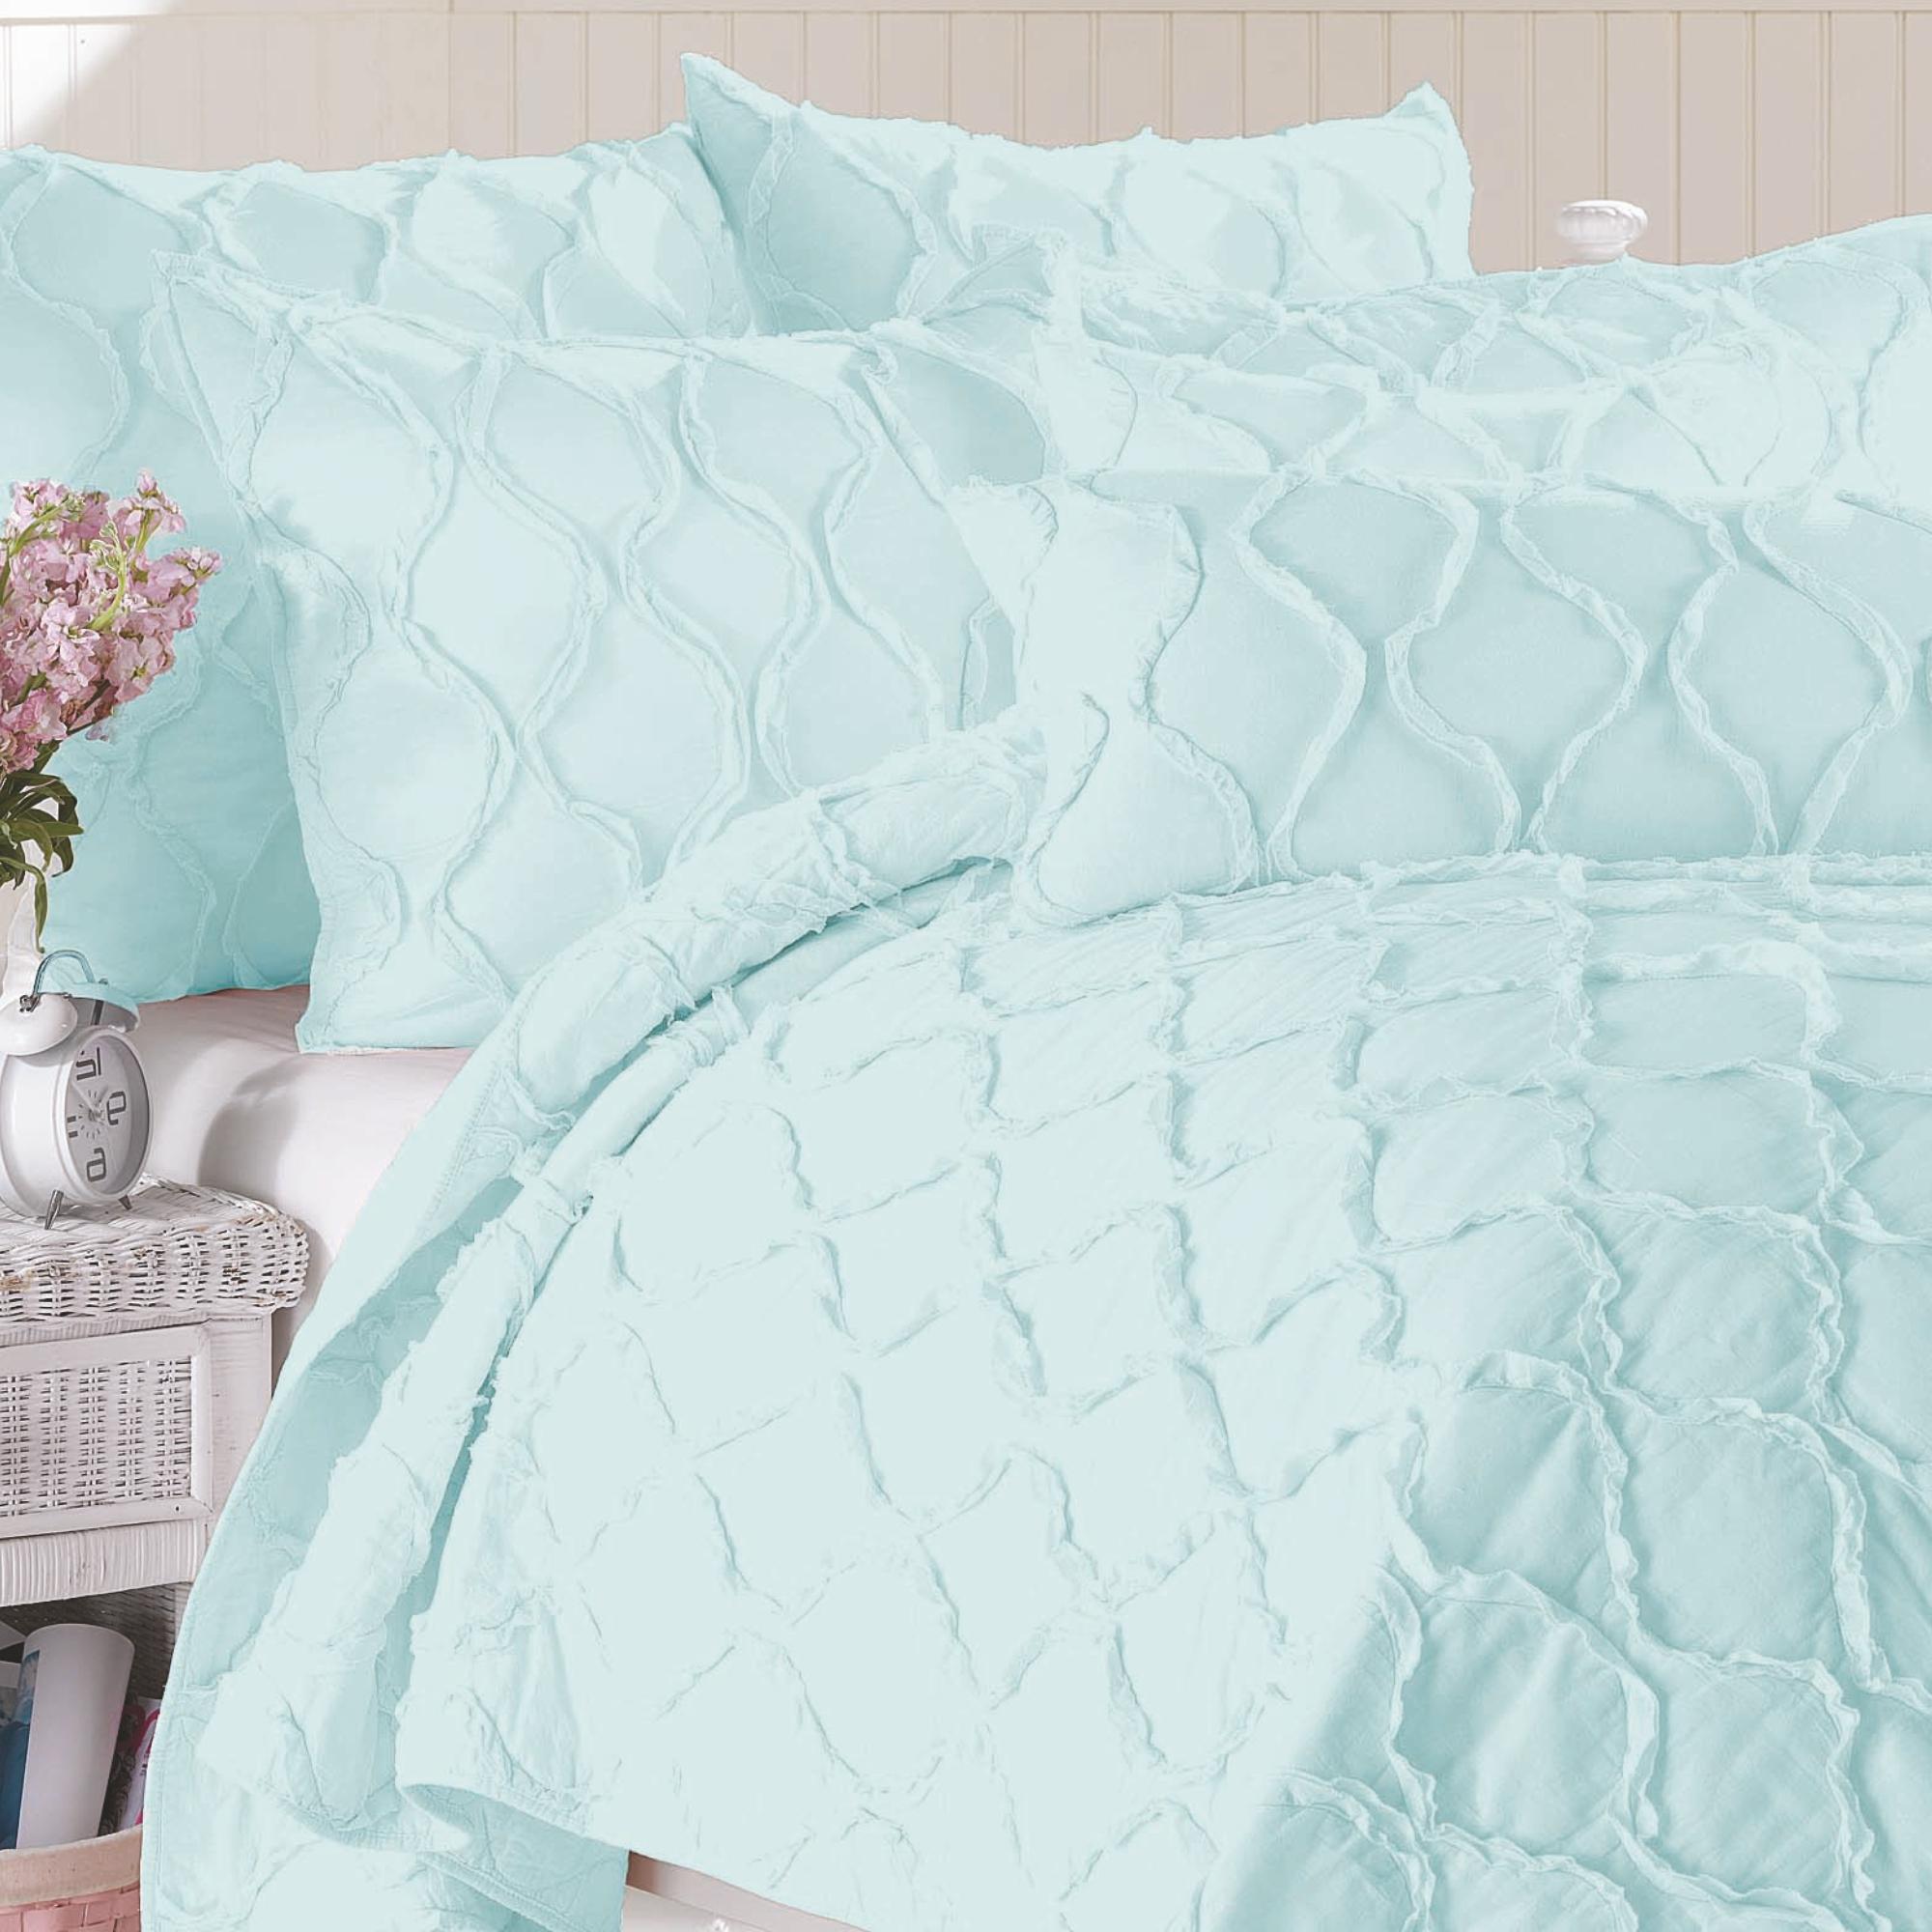 California Design Den Wavy S Cotton Bright White, Twin/Twin XL 2-Piece Ruffled Quilt Set